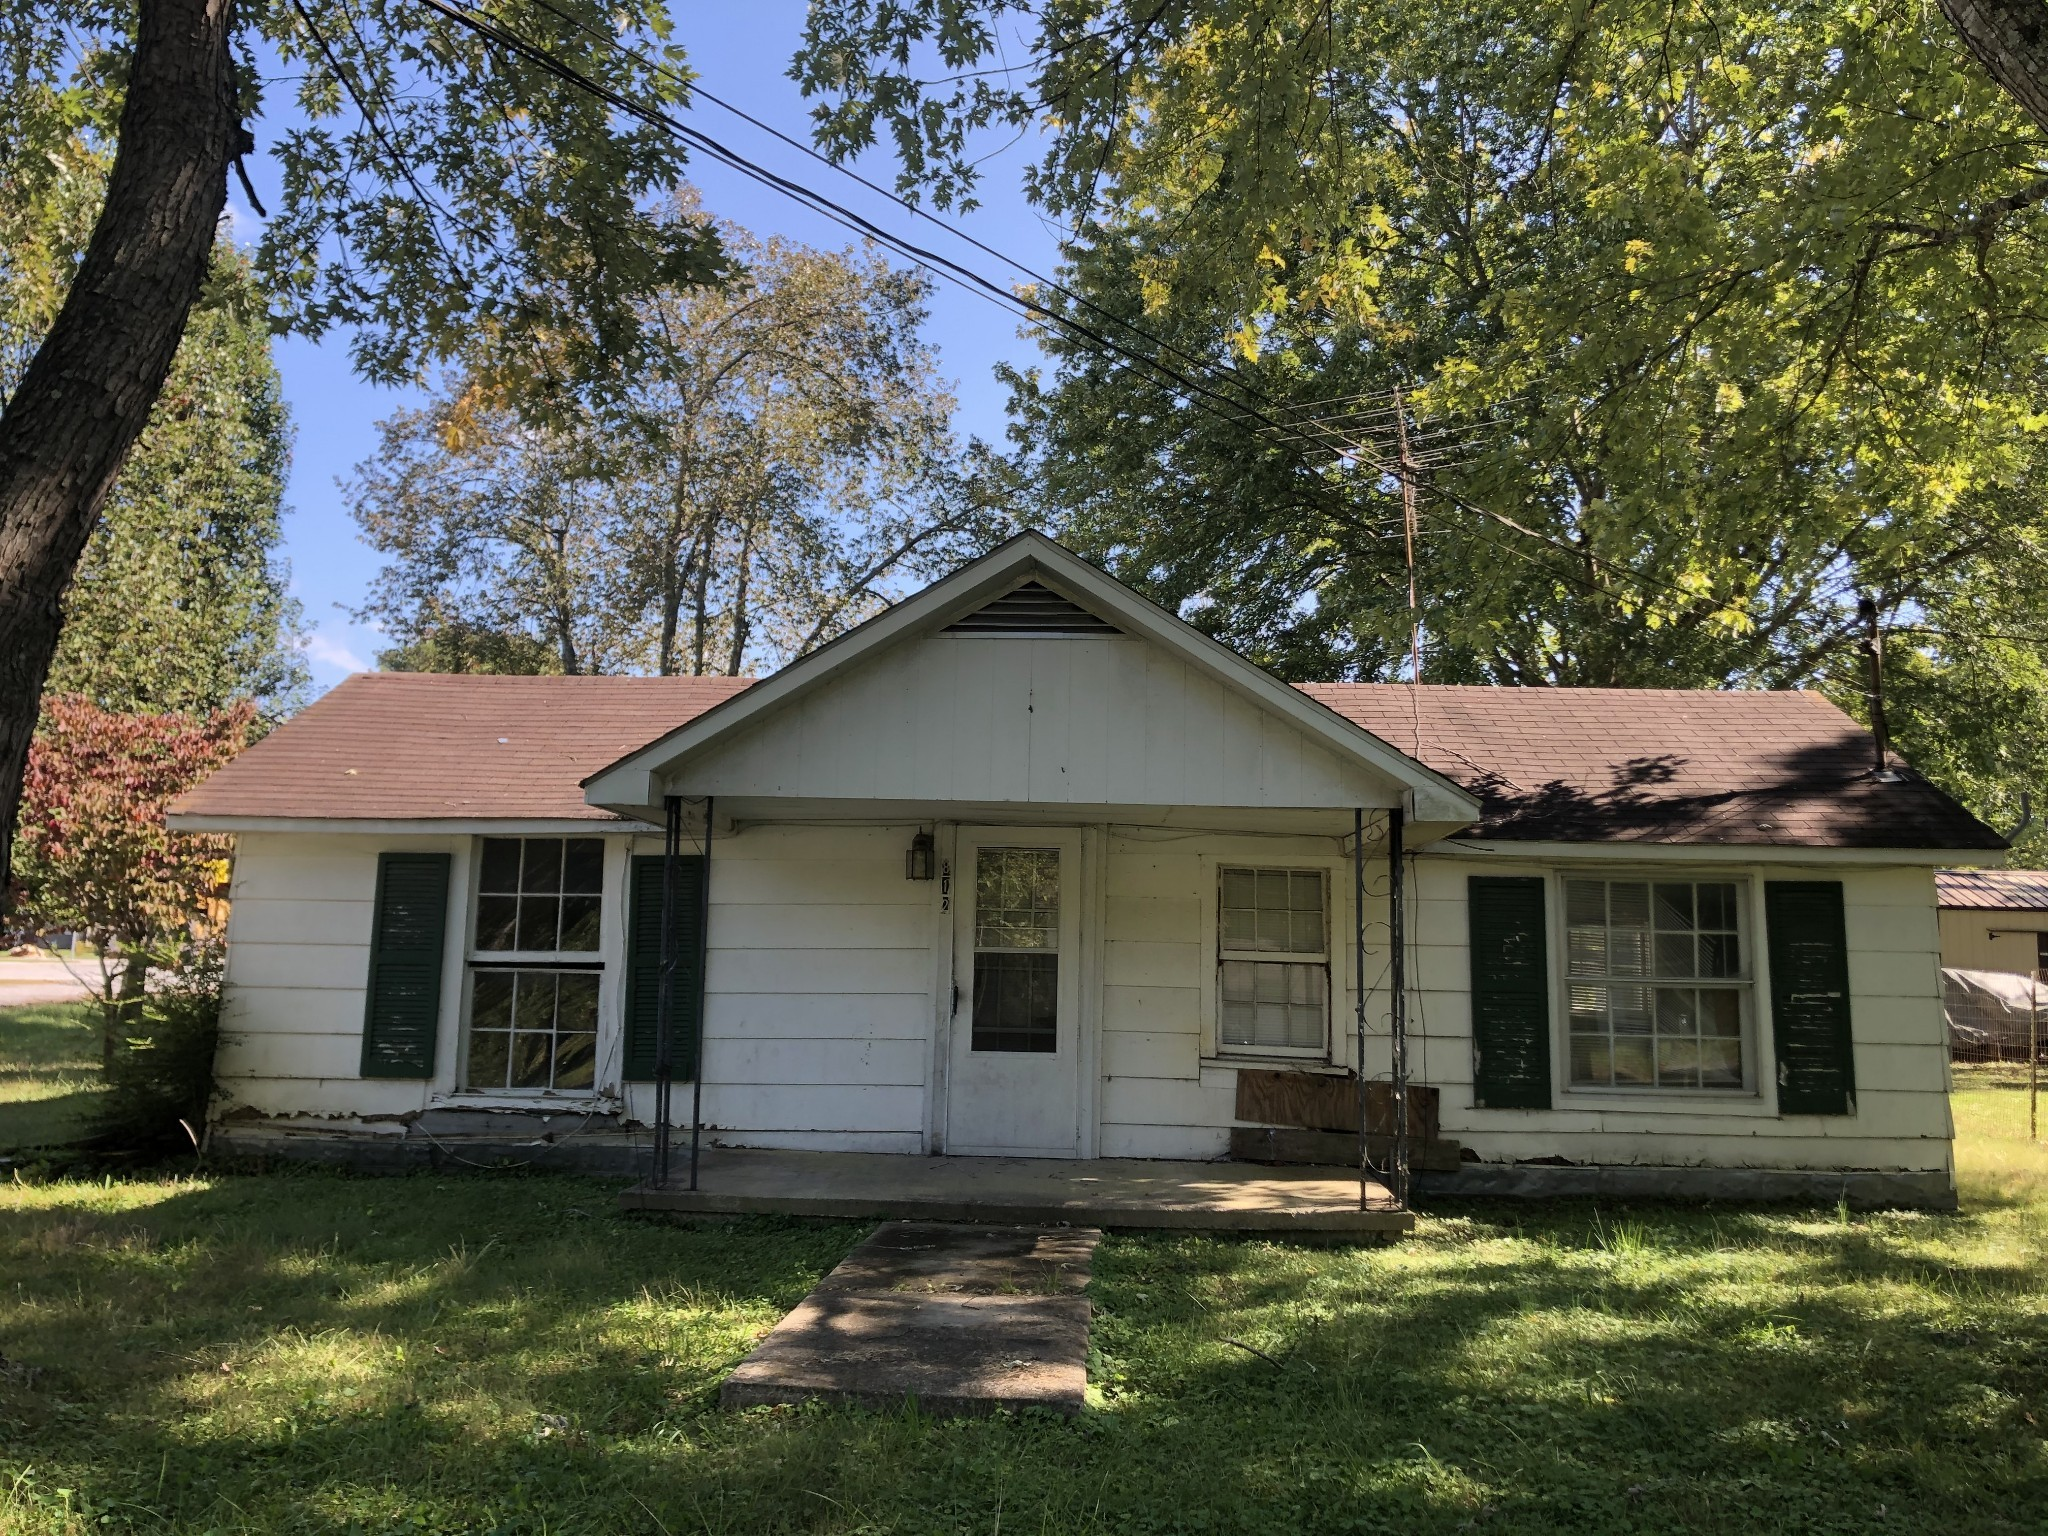 812 E Grundy St Property Photo - Tullahoma, TN real estate listing